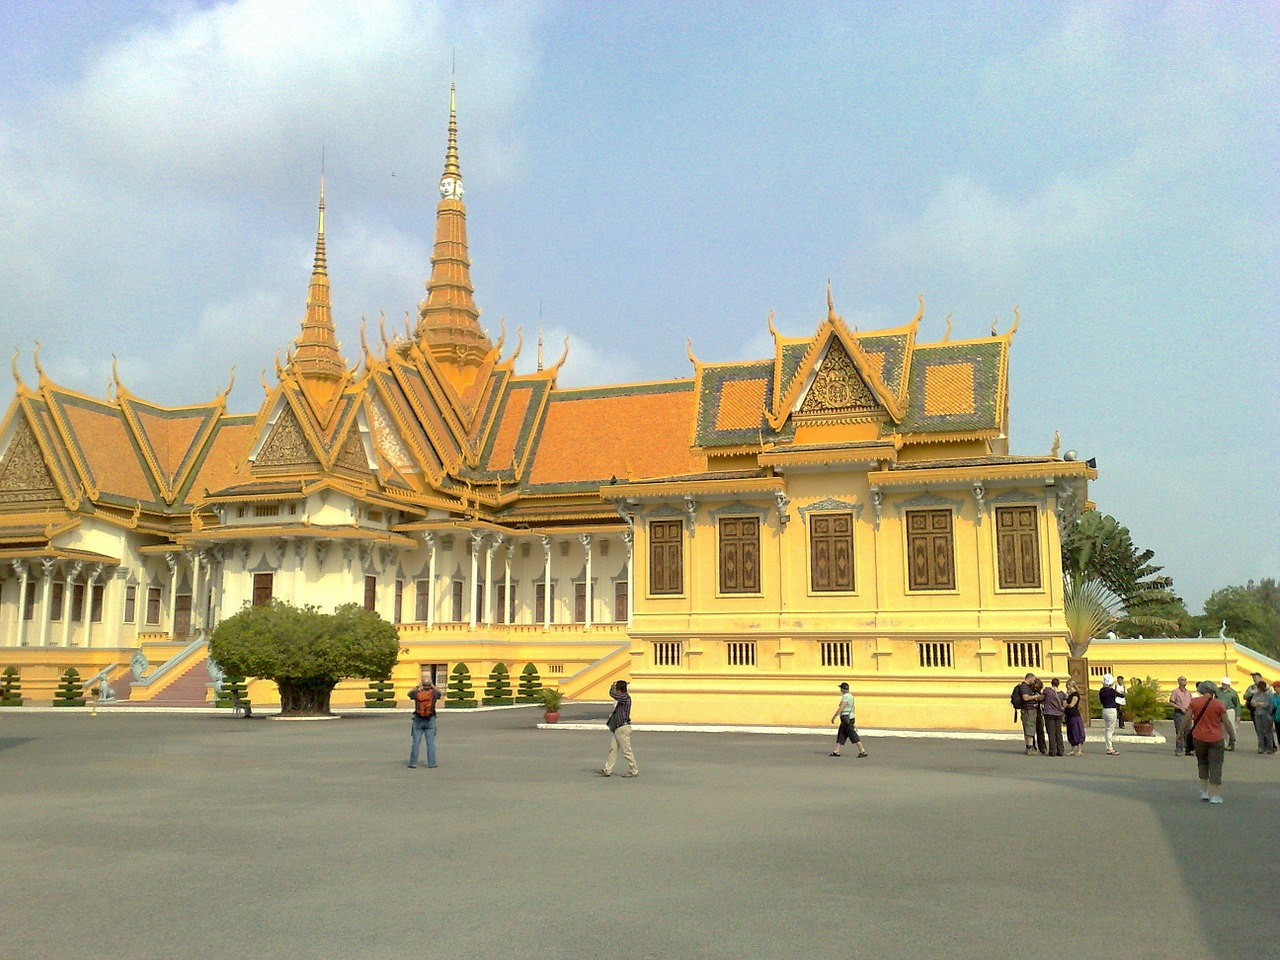 18-12-15 phnom-penh-99634_1280